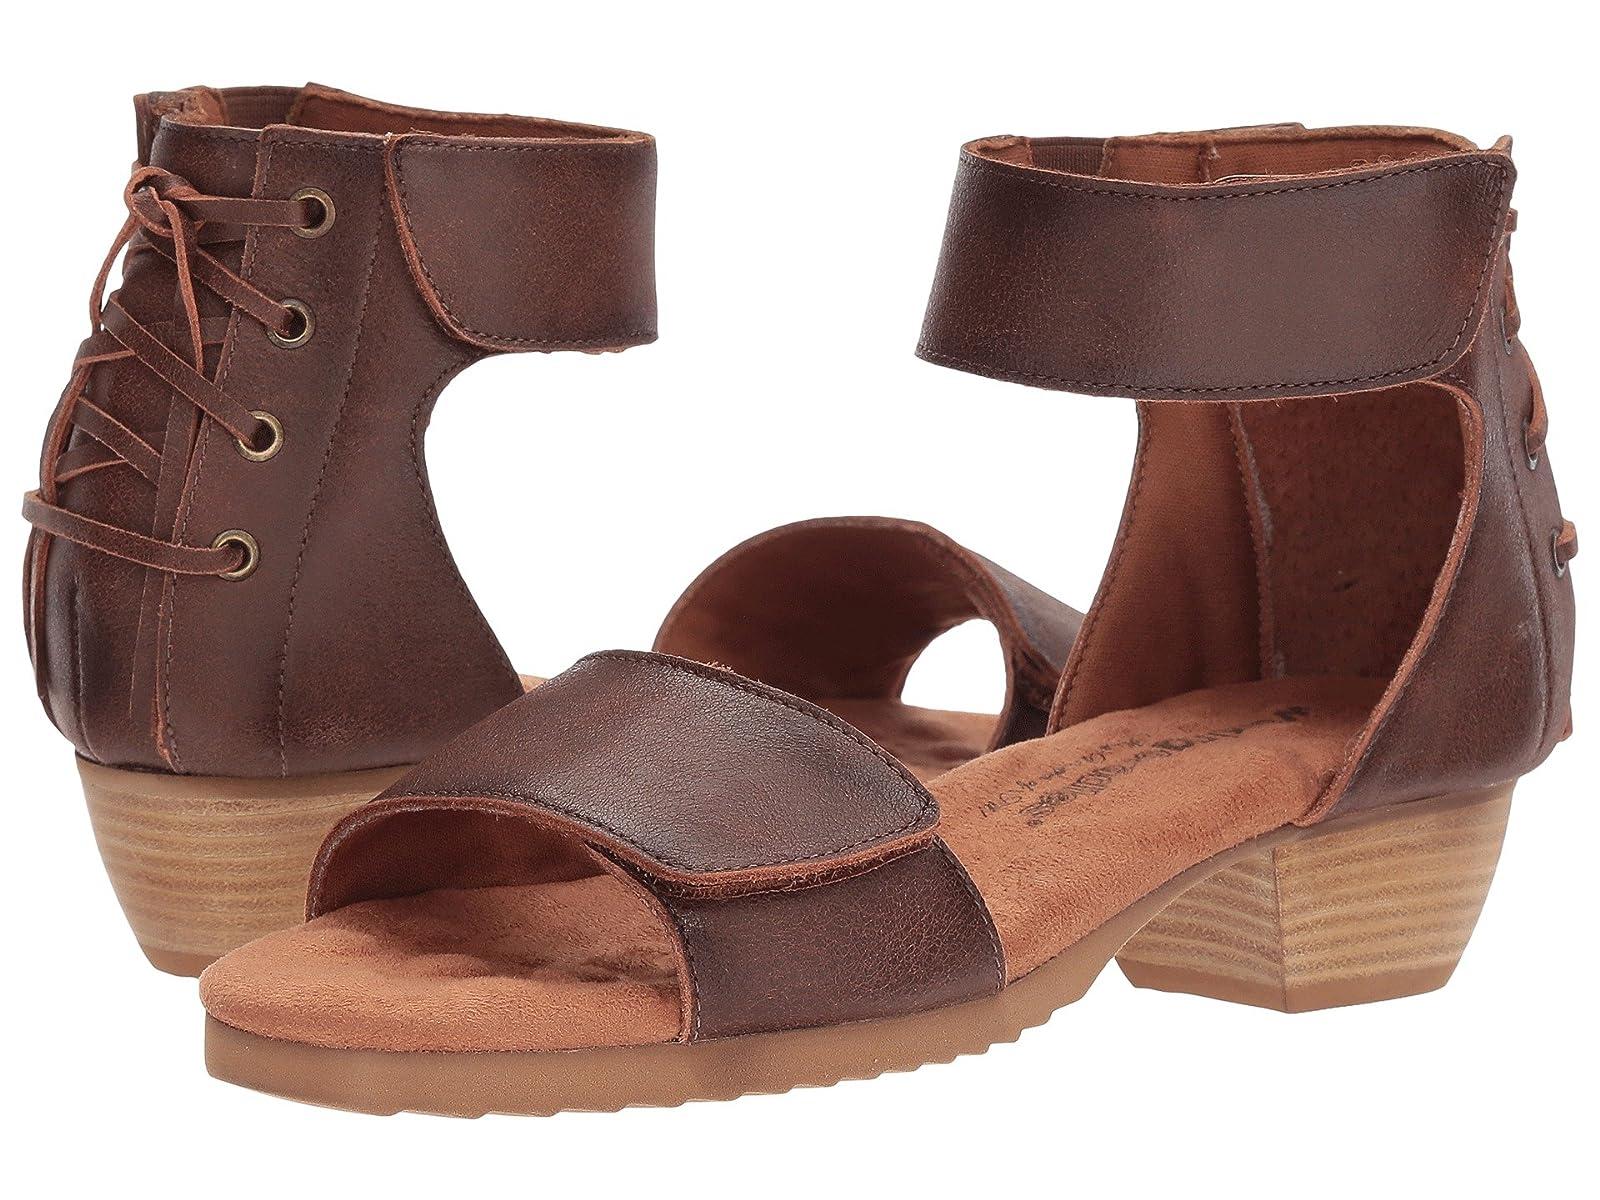 Walking Cradles CrosbyCheap and distinctive eye-catching shoes